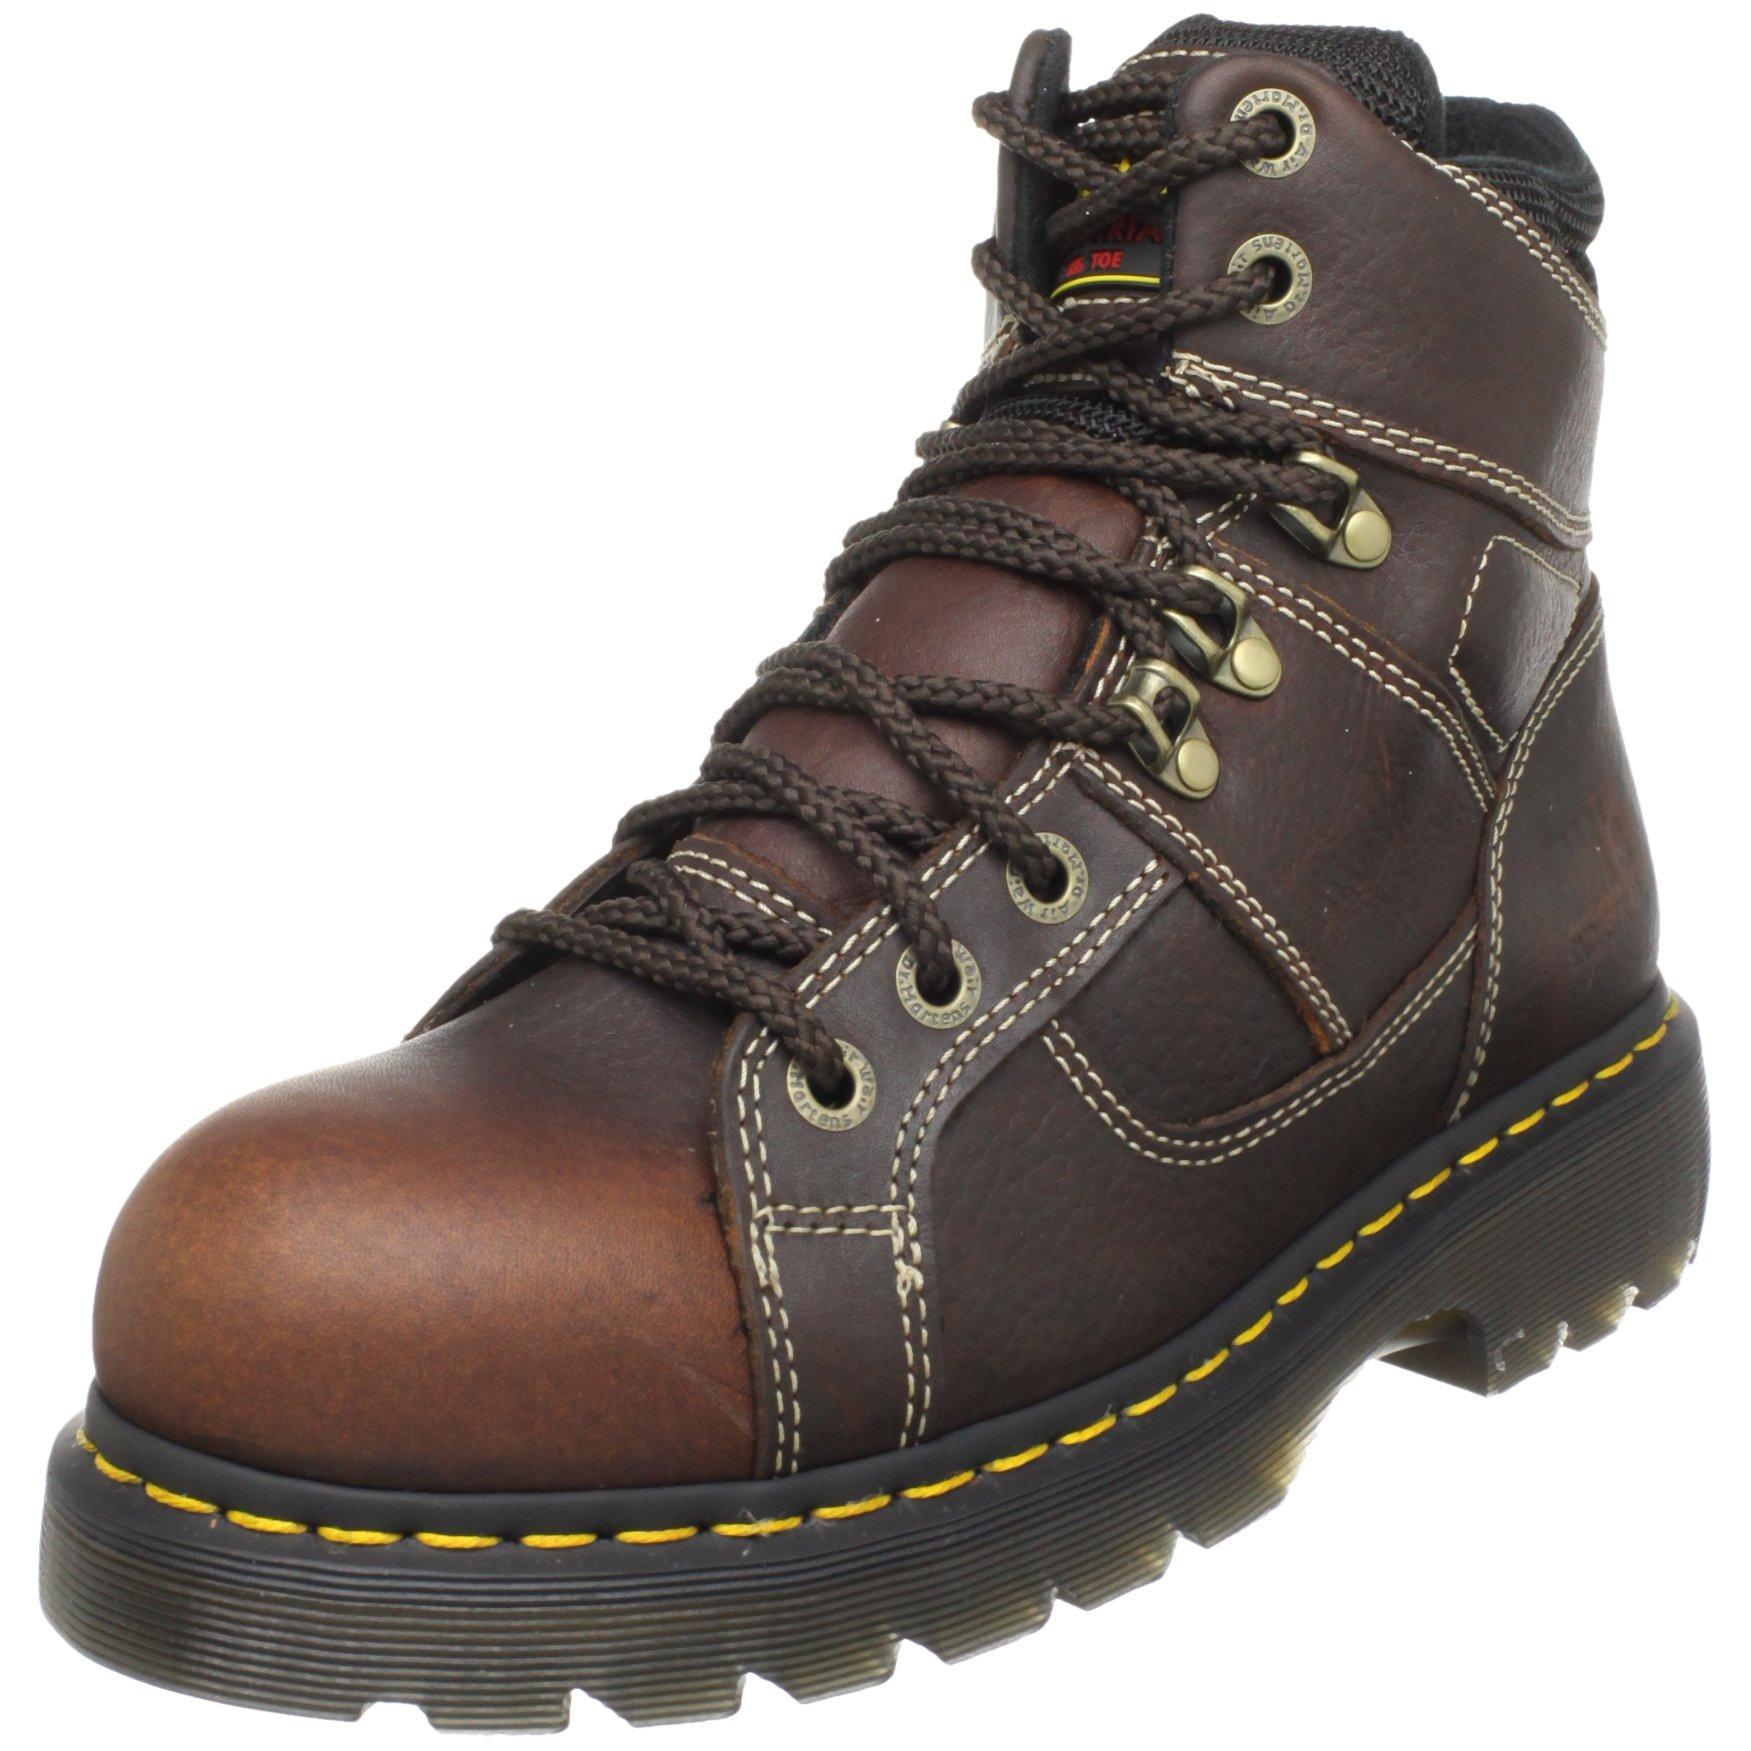 Dr. Martens Ironbridge Safety Toe Boot,Teak,9 UK/11 M US Women's/10 M US Men's